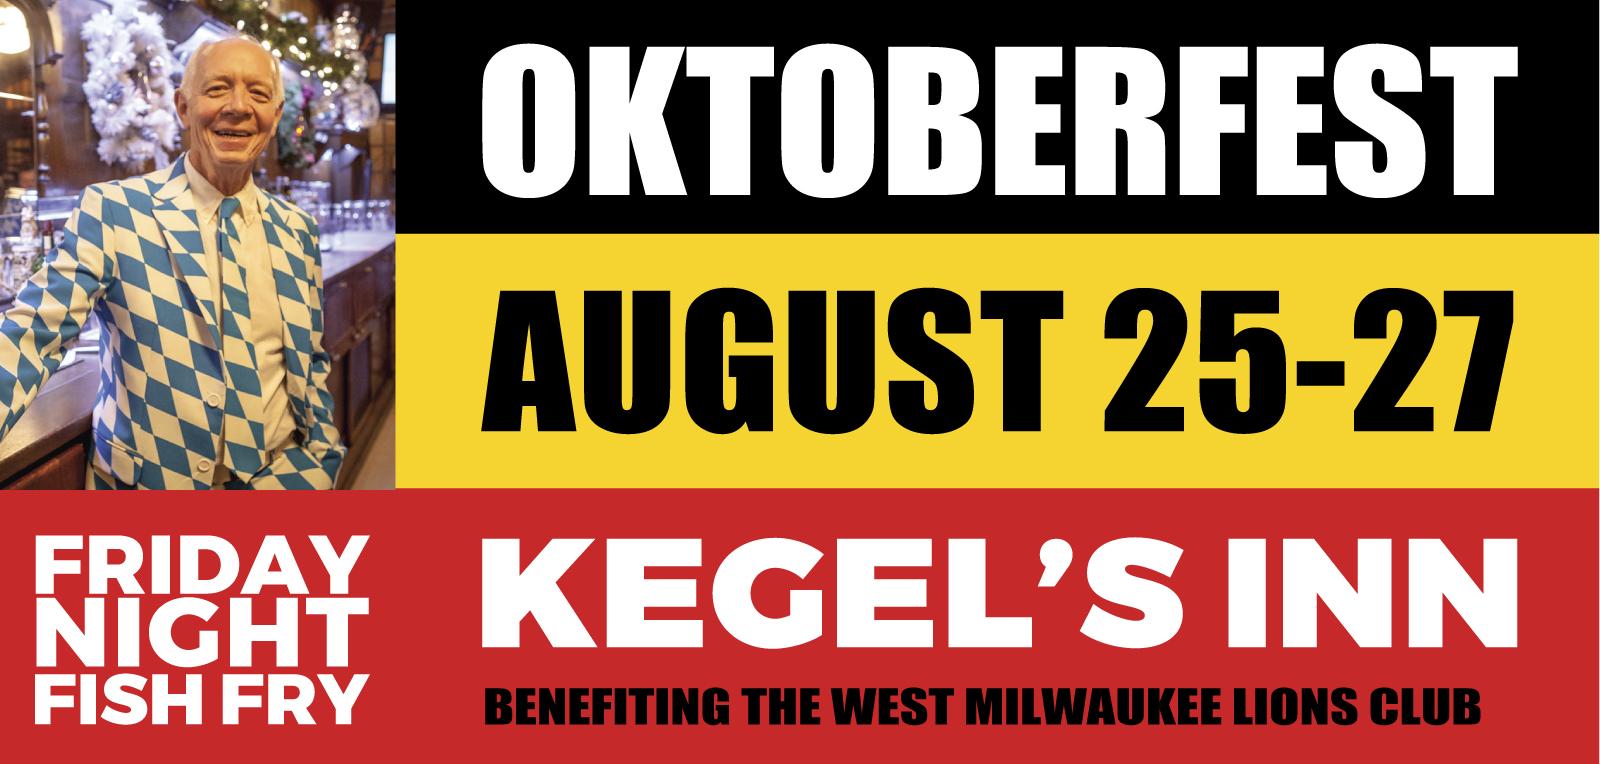 Milwaukee's first Oktoberfest 2017 august 25-27